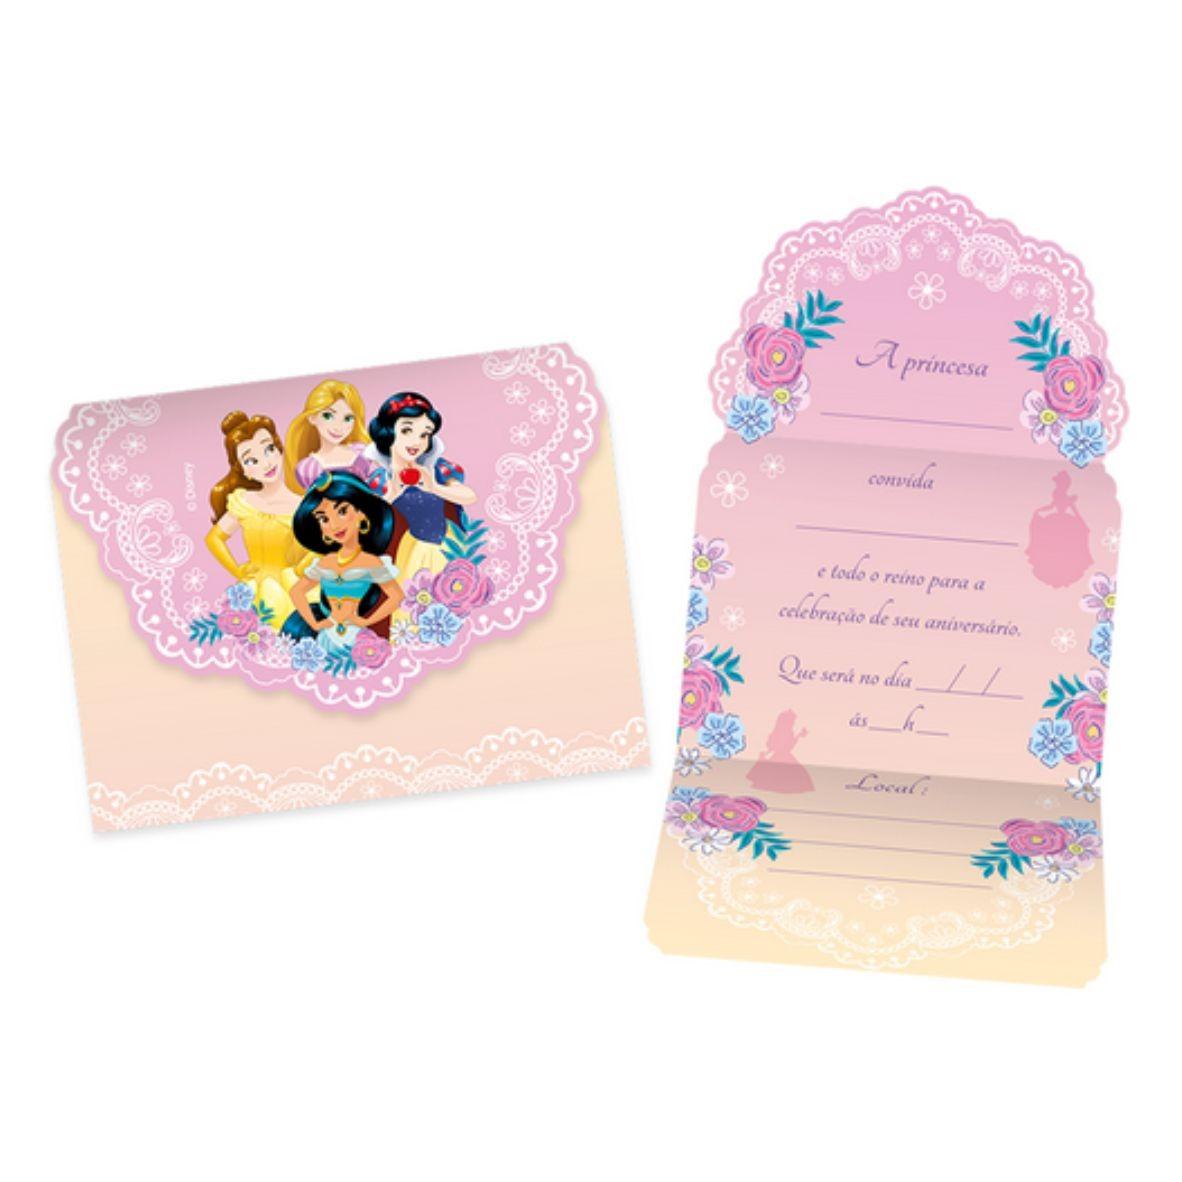 Convite grande Princesa com 8 unidades